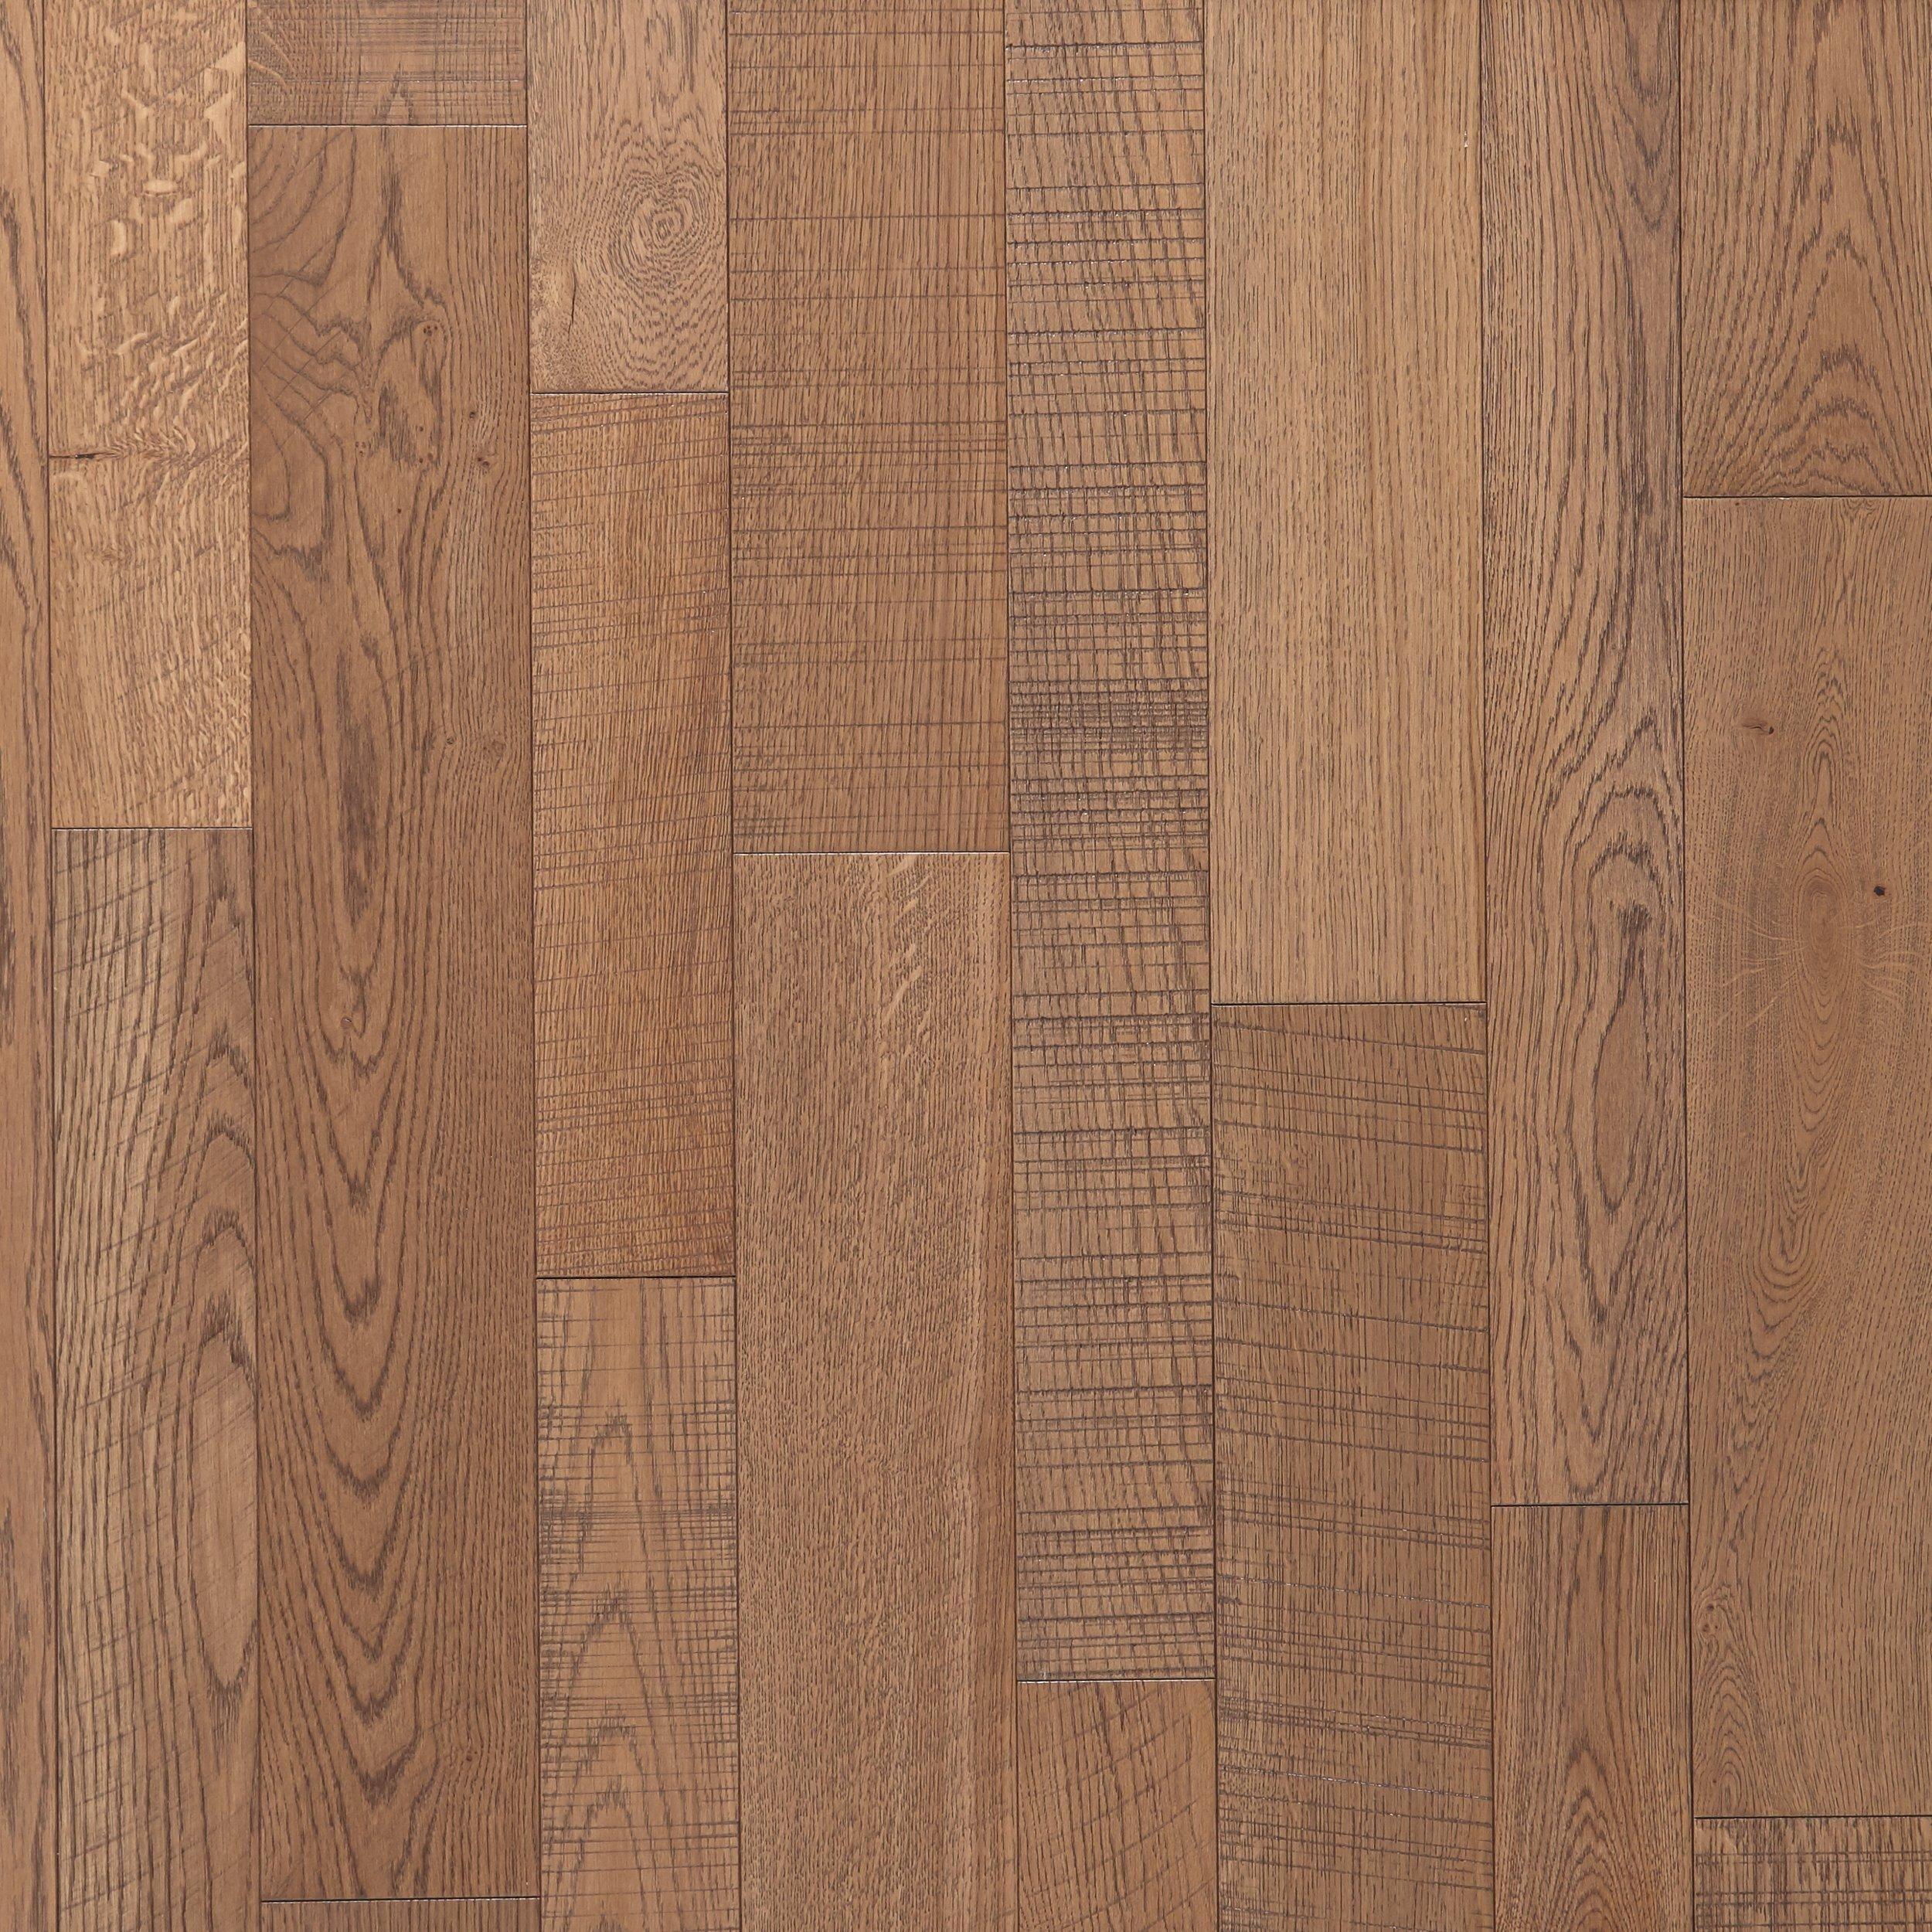 White Oak Engineered Hardwood Floor Decor Hardwood Engineered Hardwood Engineered Wood Floors